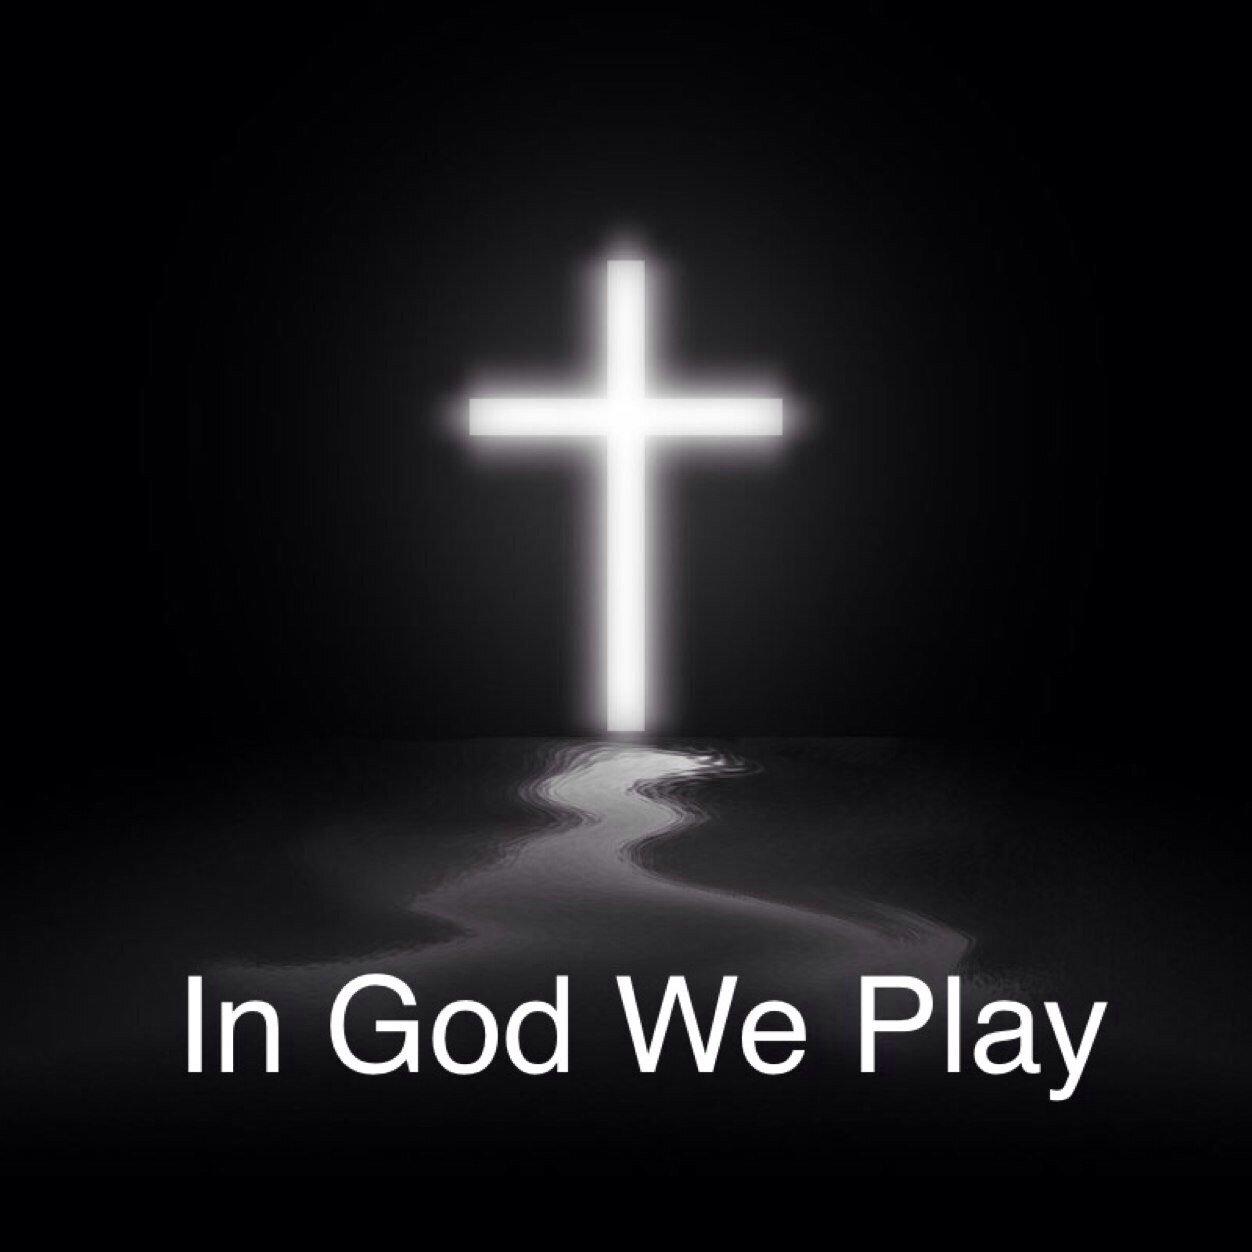 Christian Athlete Quotes: Christian Athlete (@playingforHim)